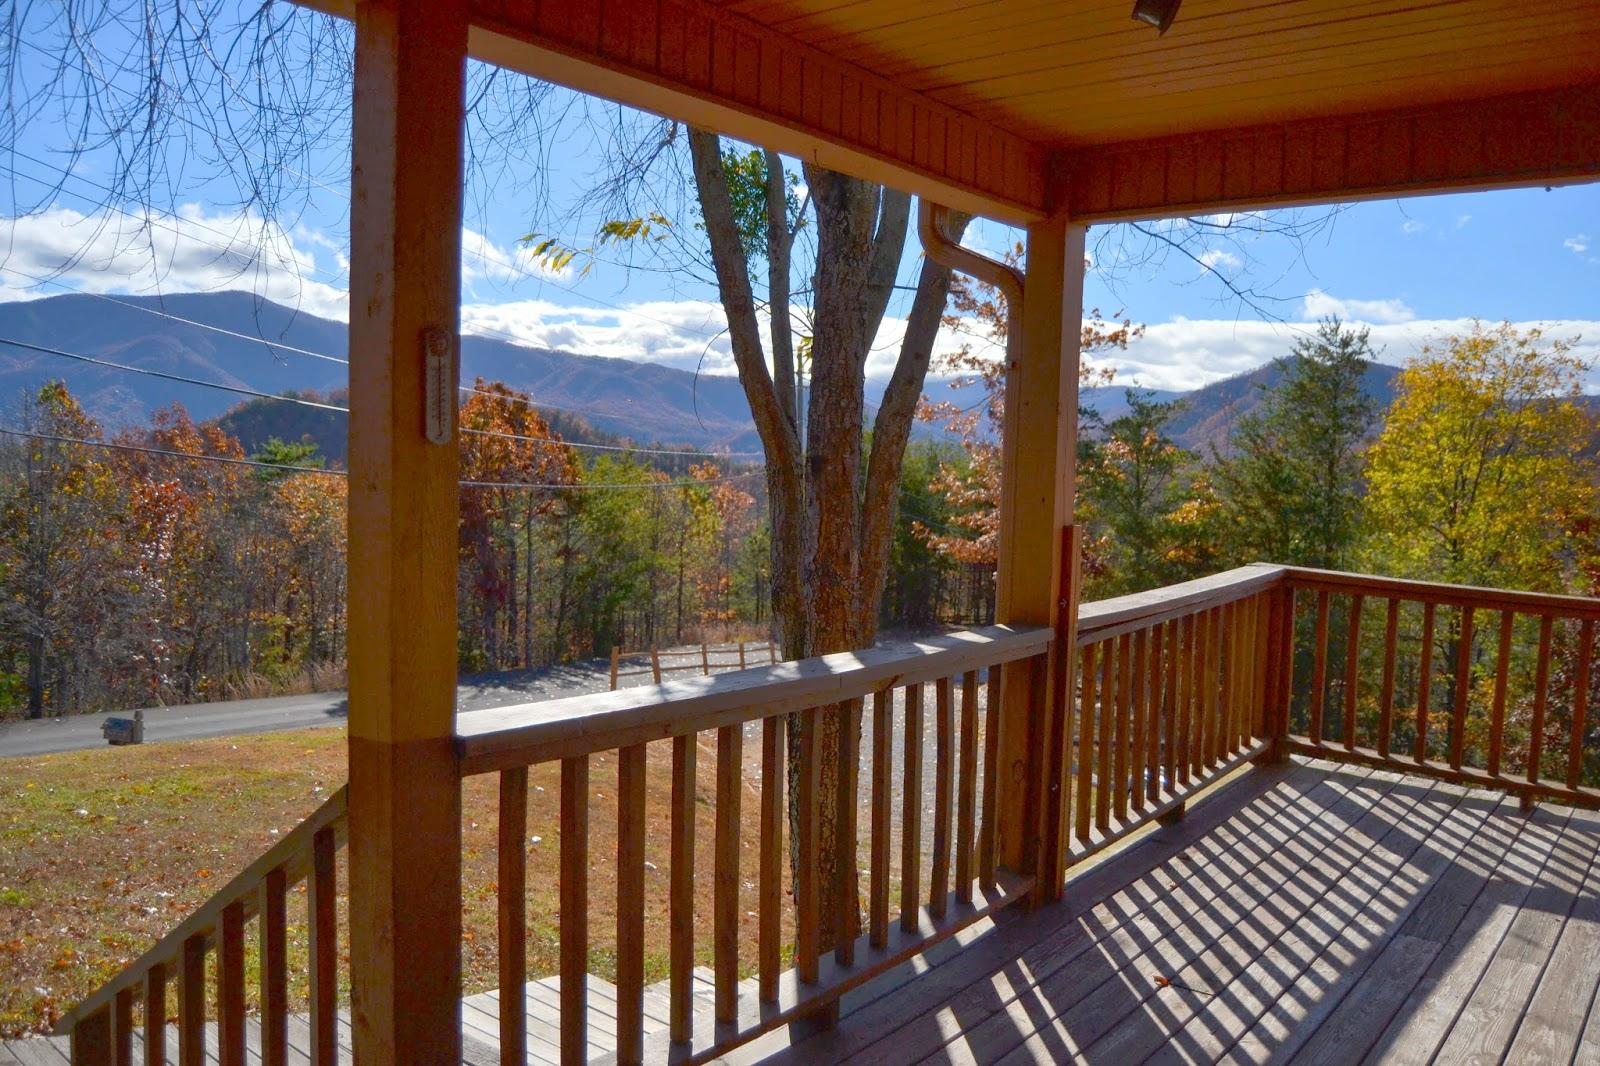 Heavenly Cabins Smoky Mountain Cabin Rentals Smoky